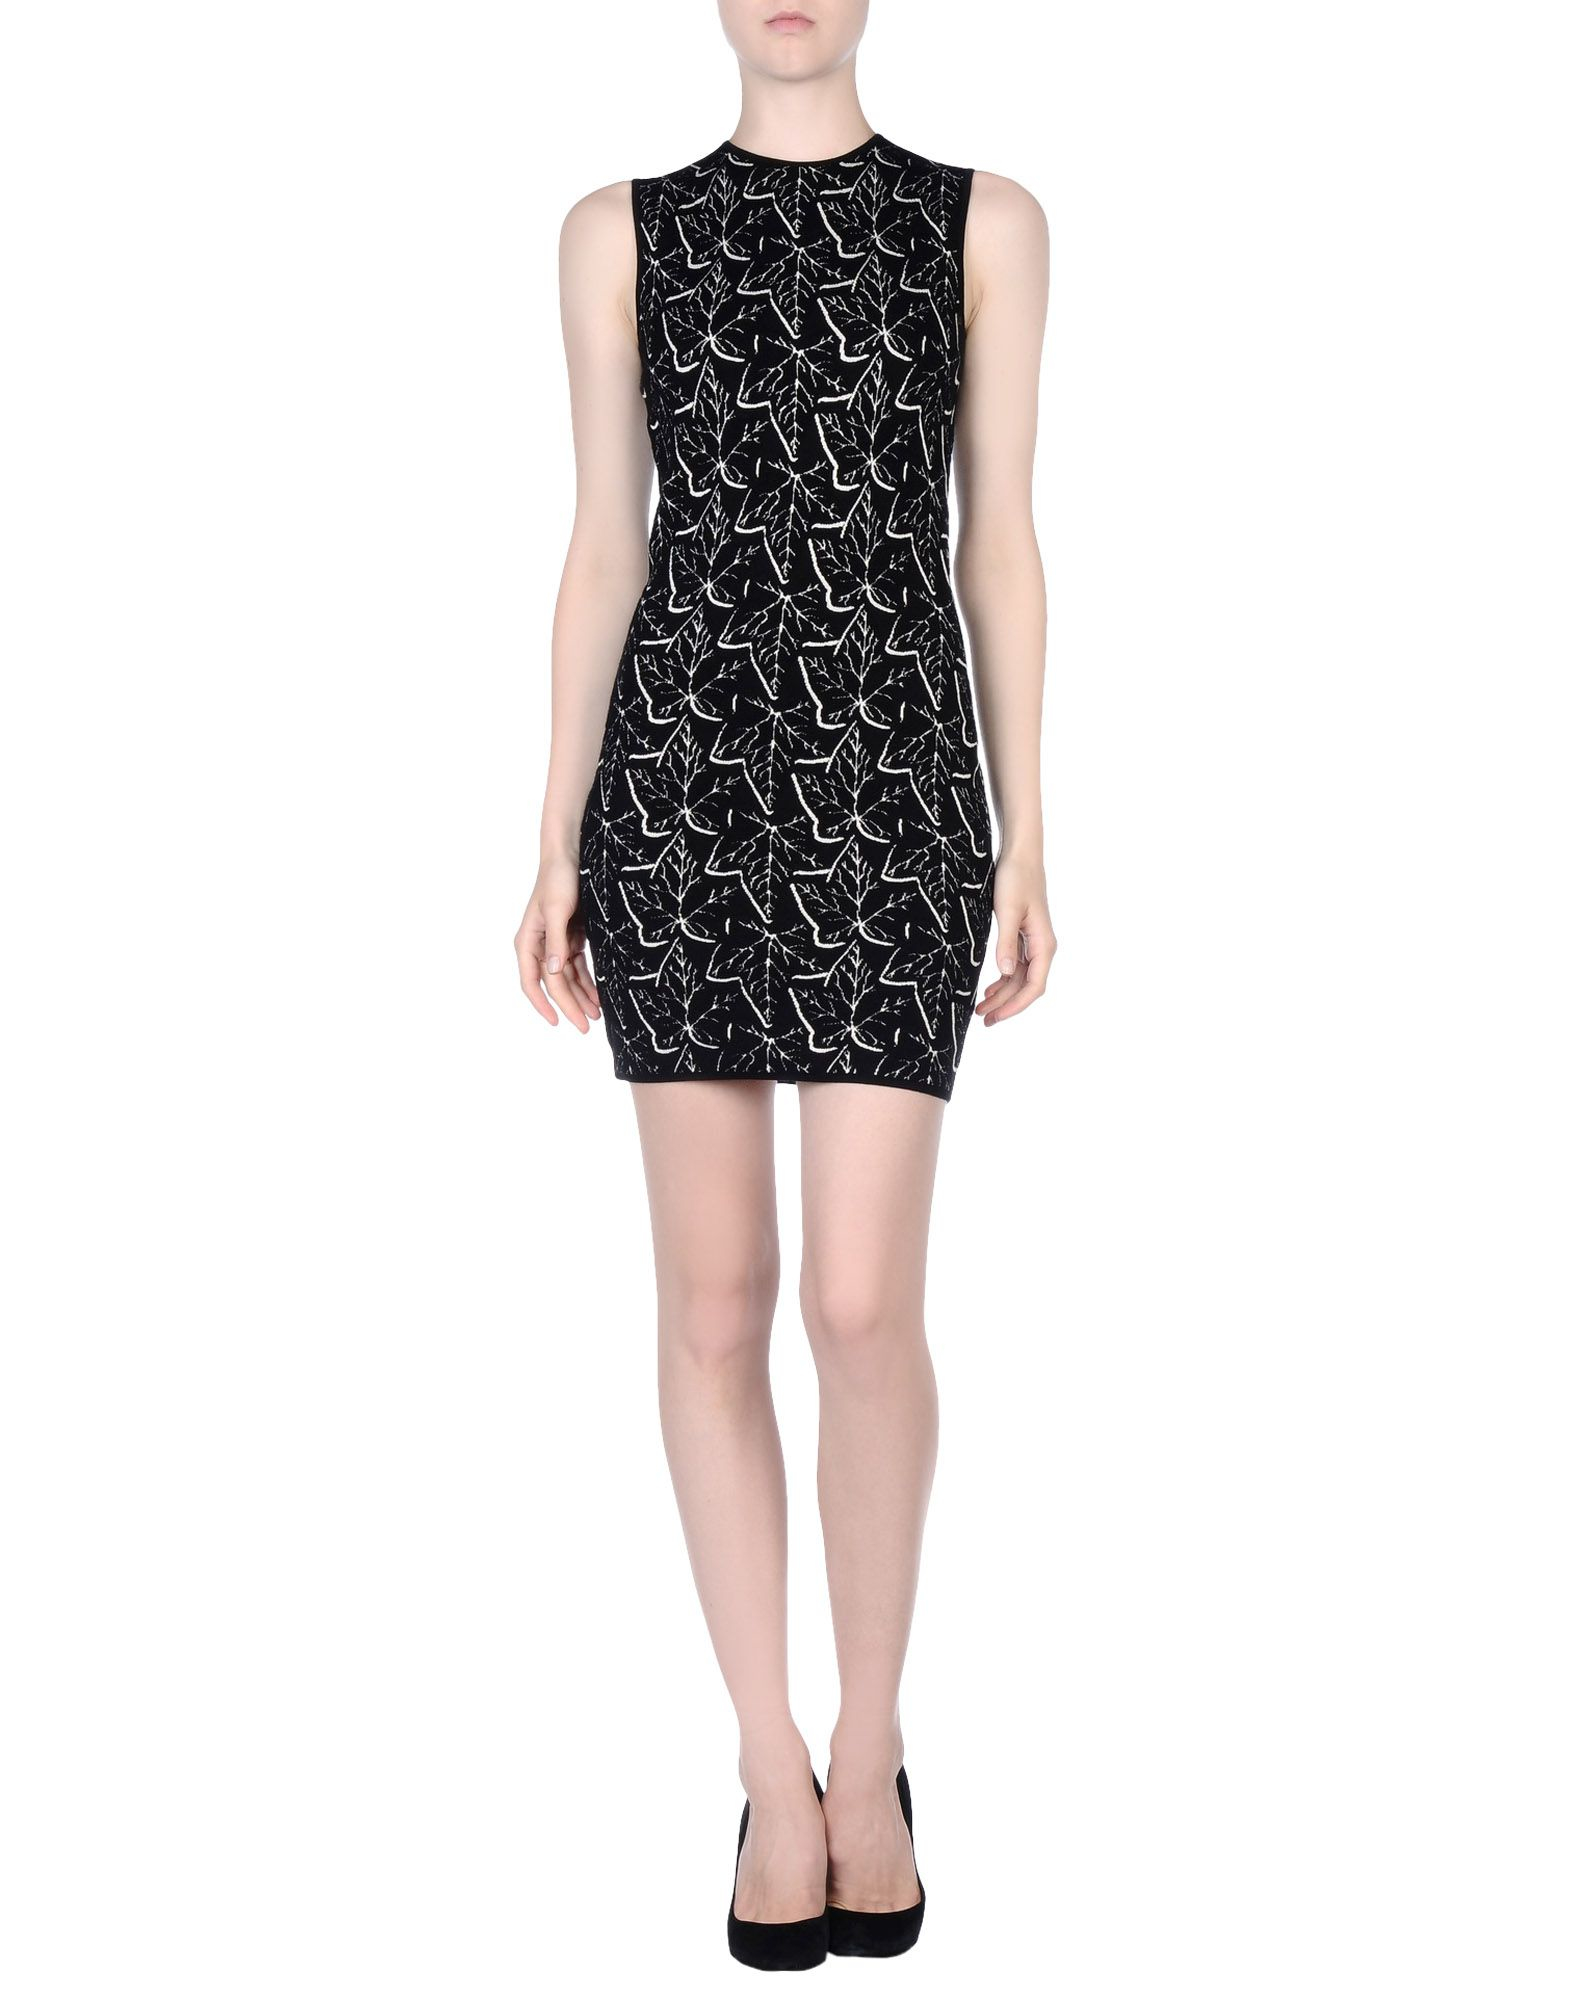 Lyst - Alexander Mcqueen Short Dress in Black